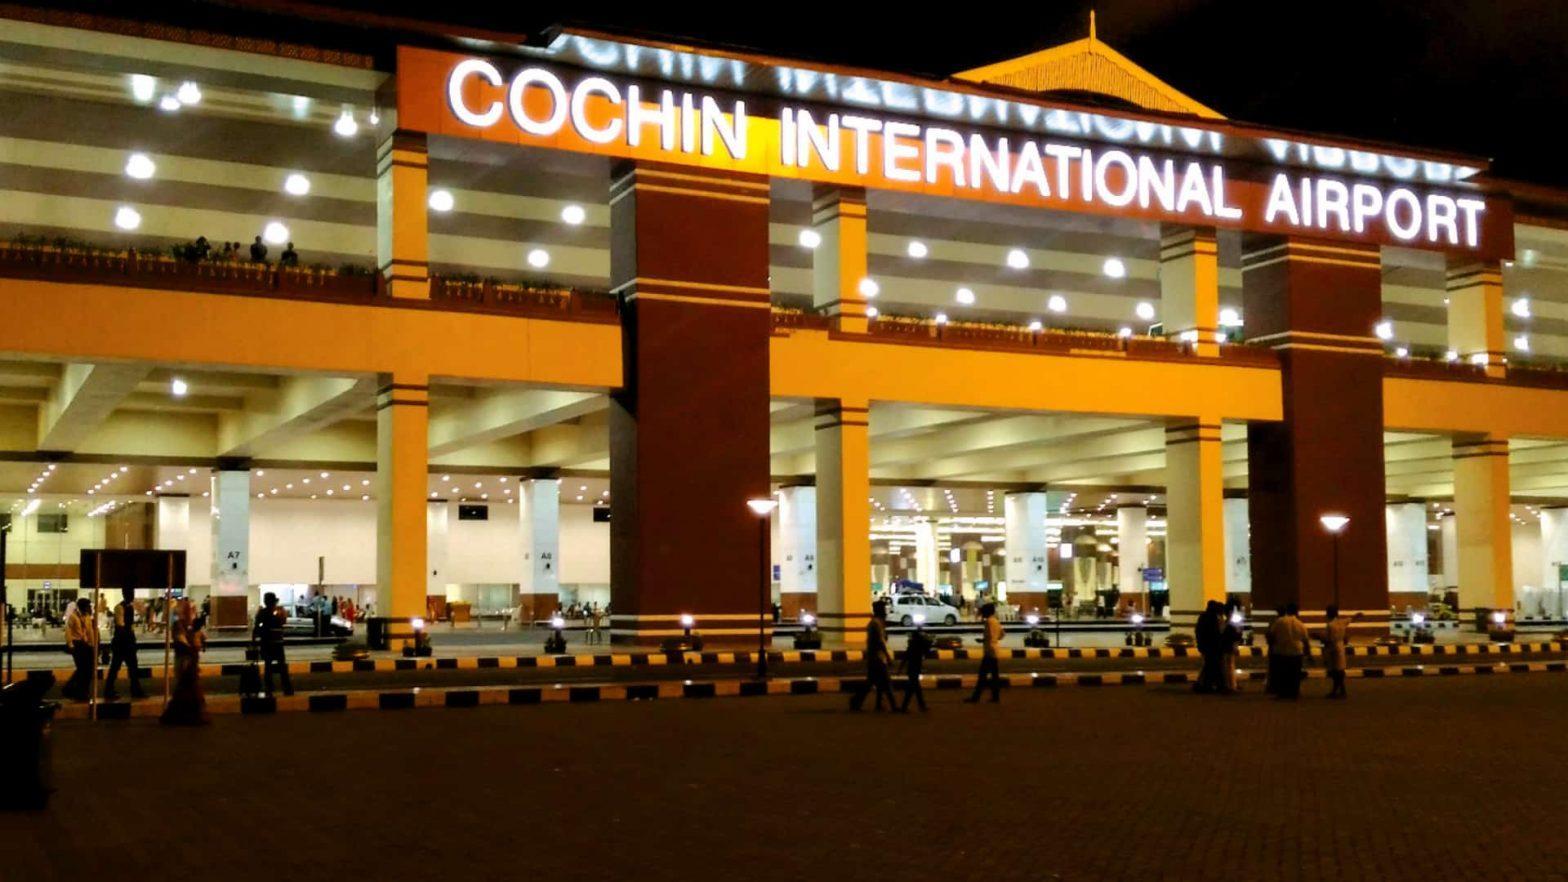 Cochin International Airport won honour in airport service quality I कोचीन आंतरराष्ट्रीय विमानतळाचा विमानतळ सेवा गुणवत्तेत सन्मान_40.1